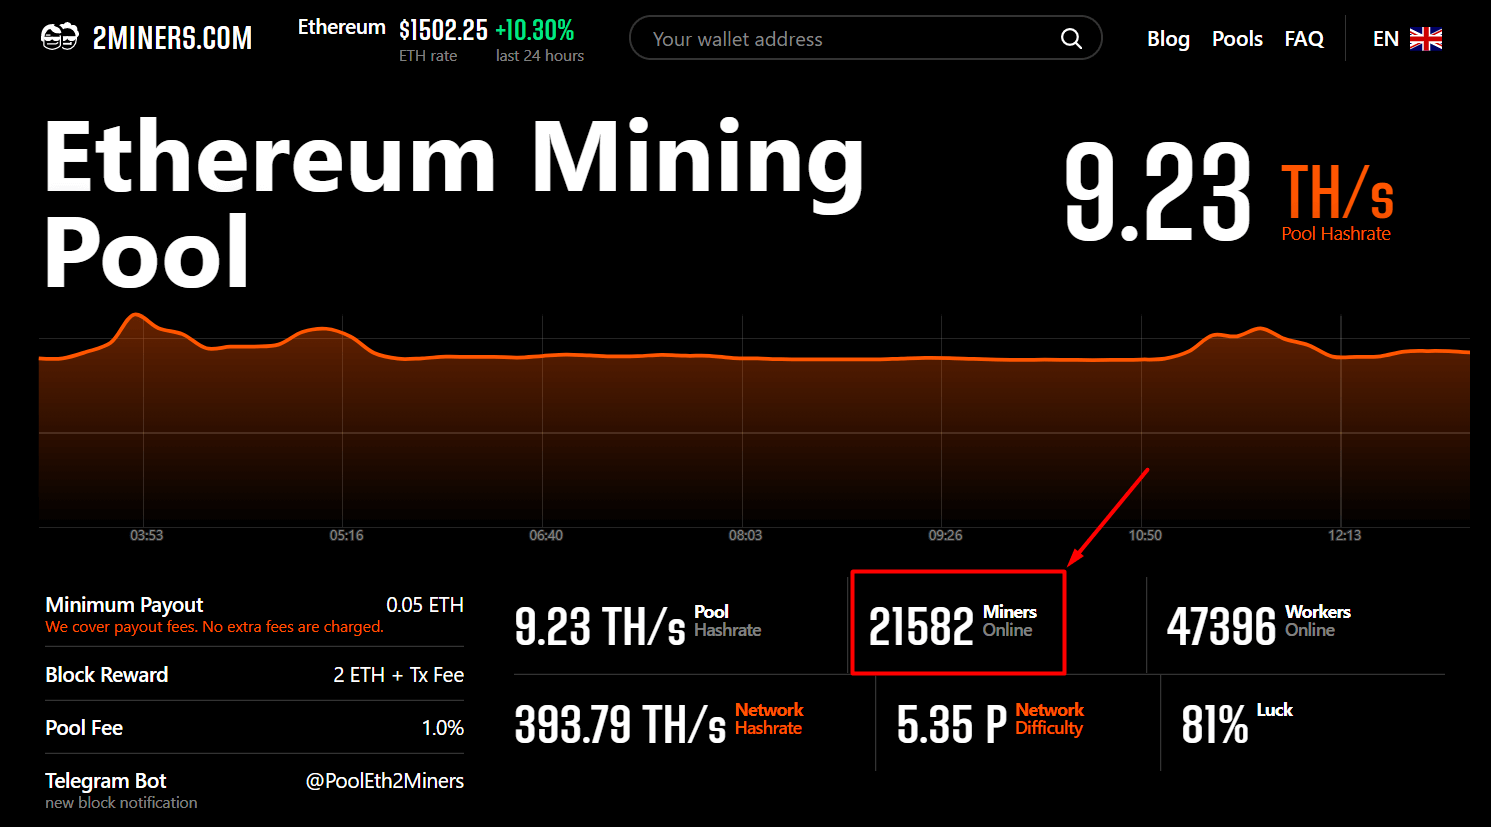 21582_miners_online